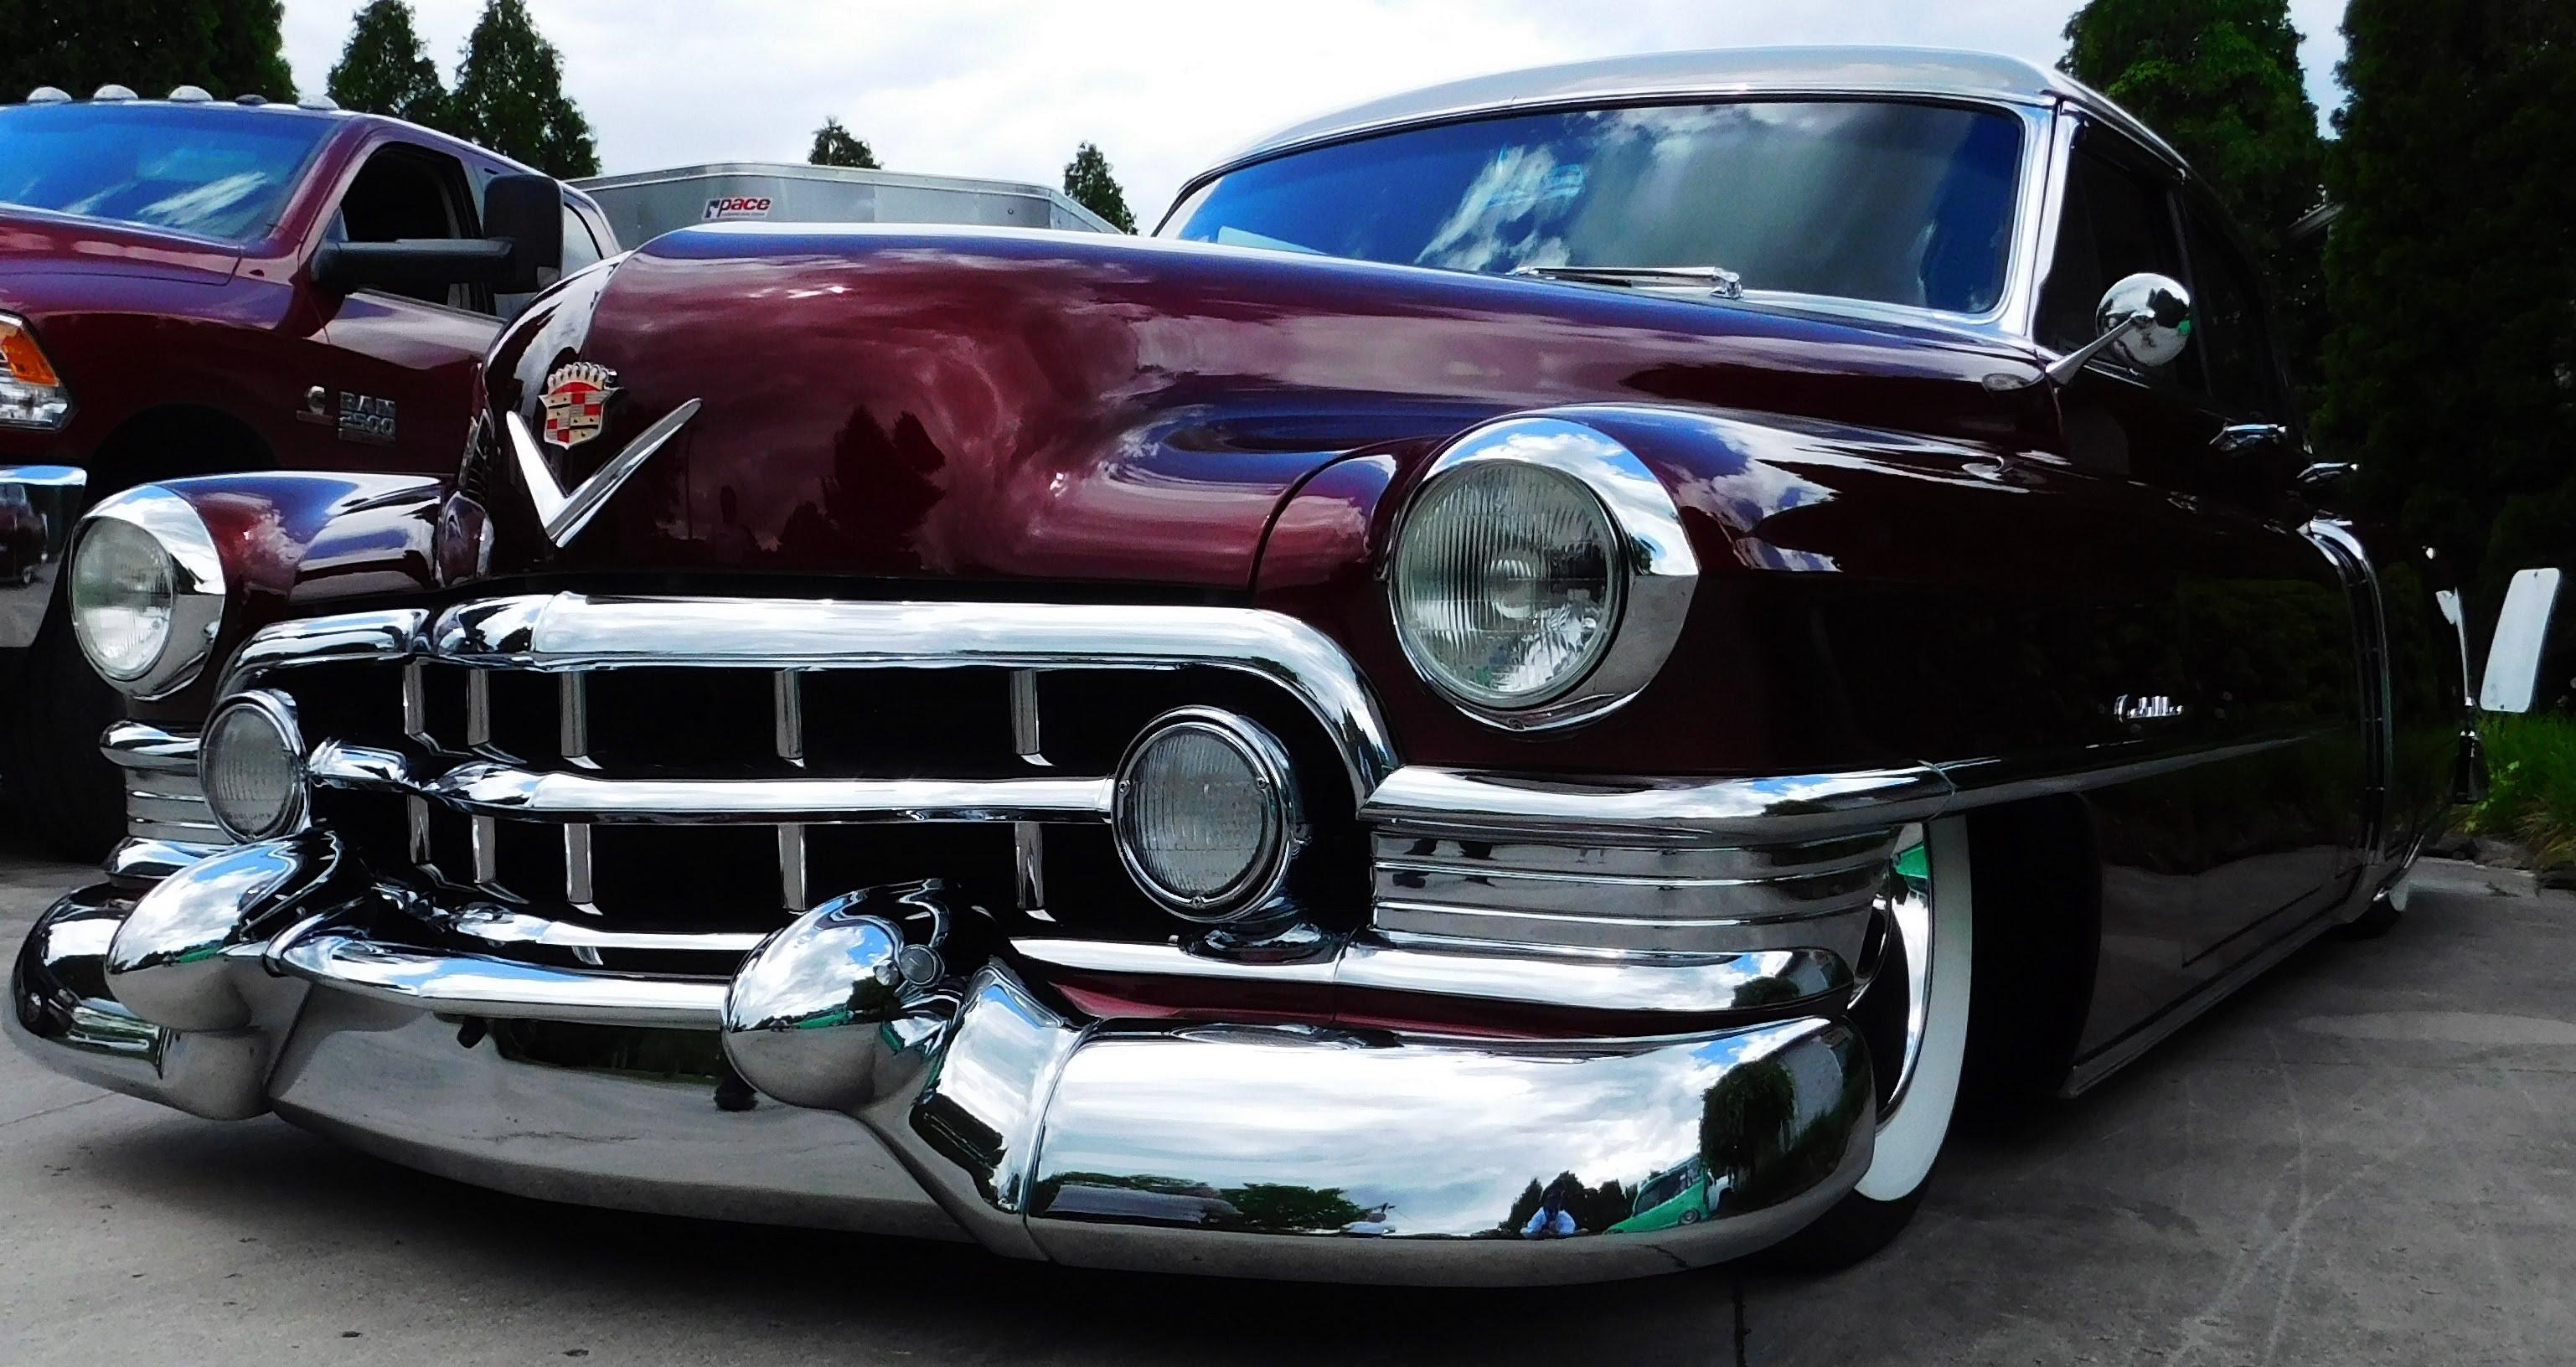 1950 Cadillac E62 Street Rod Lotacad Griffey 39 S Hot Rods